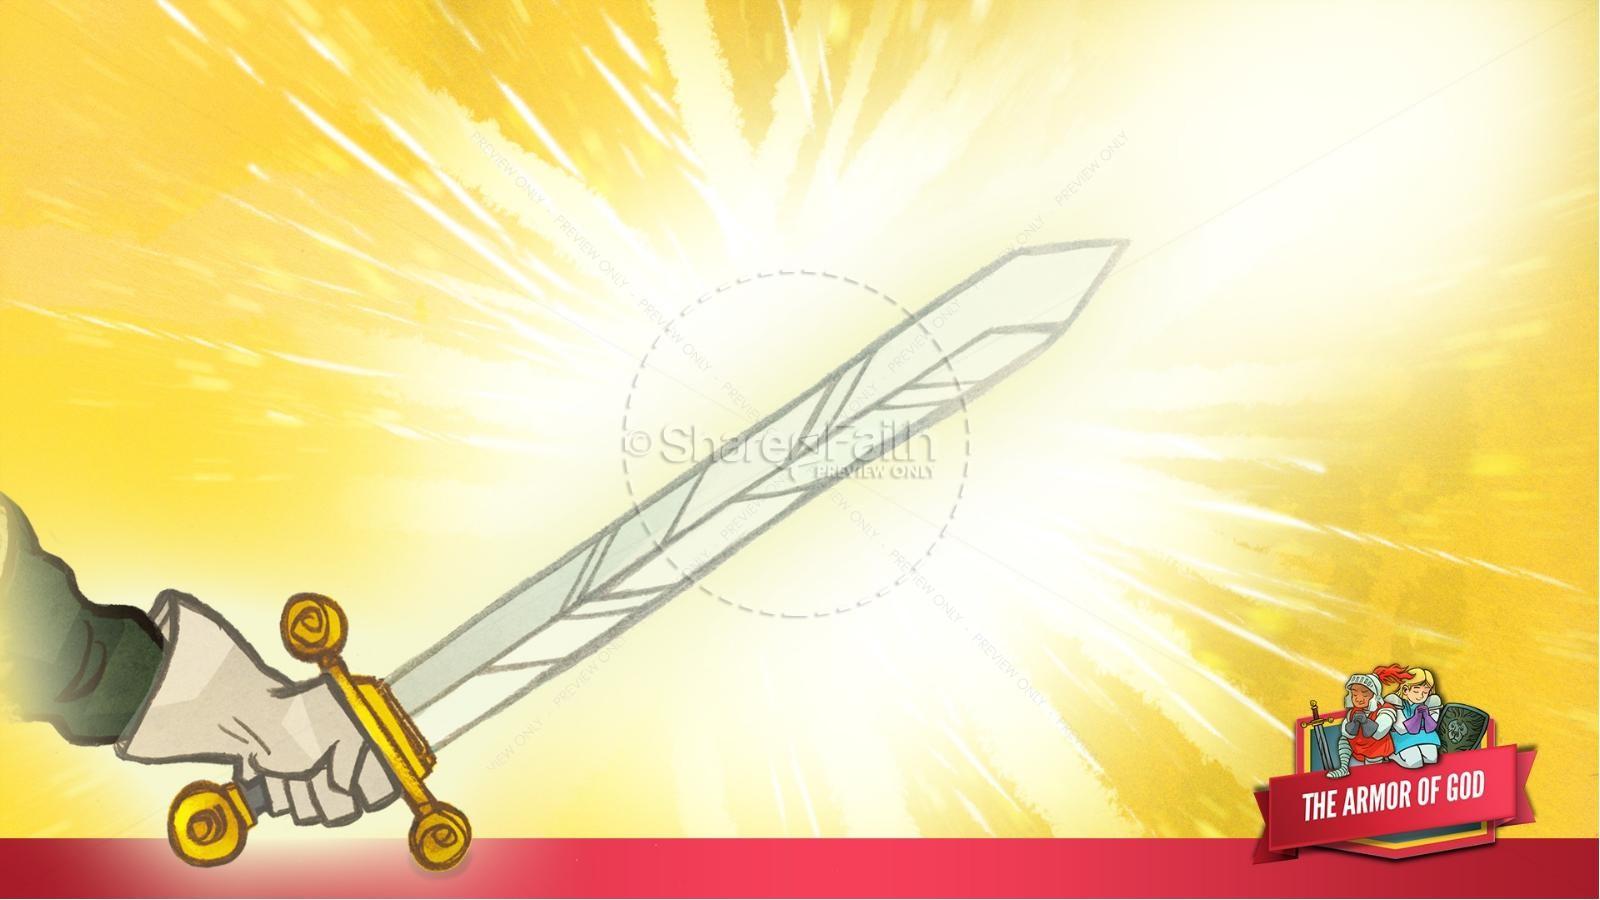 Ephesians 6 the armor of god kids bible story kids bible stories - Armor of god background ...